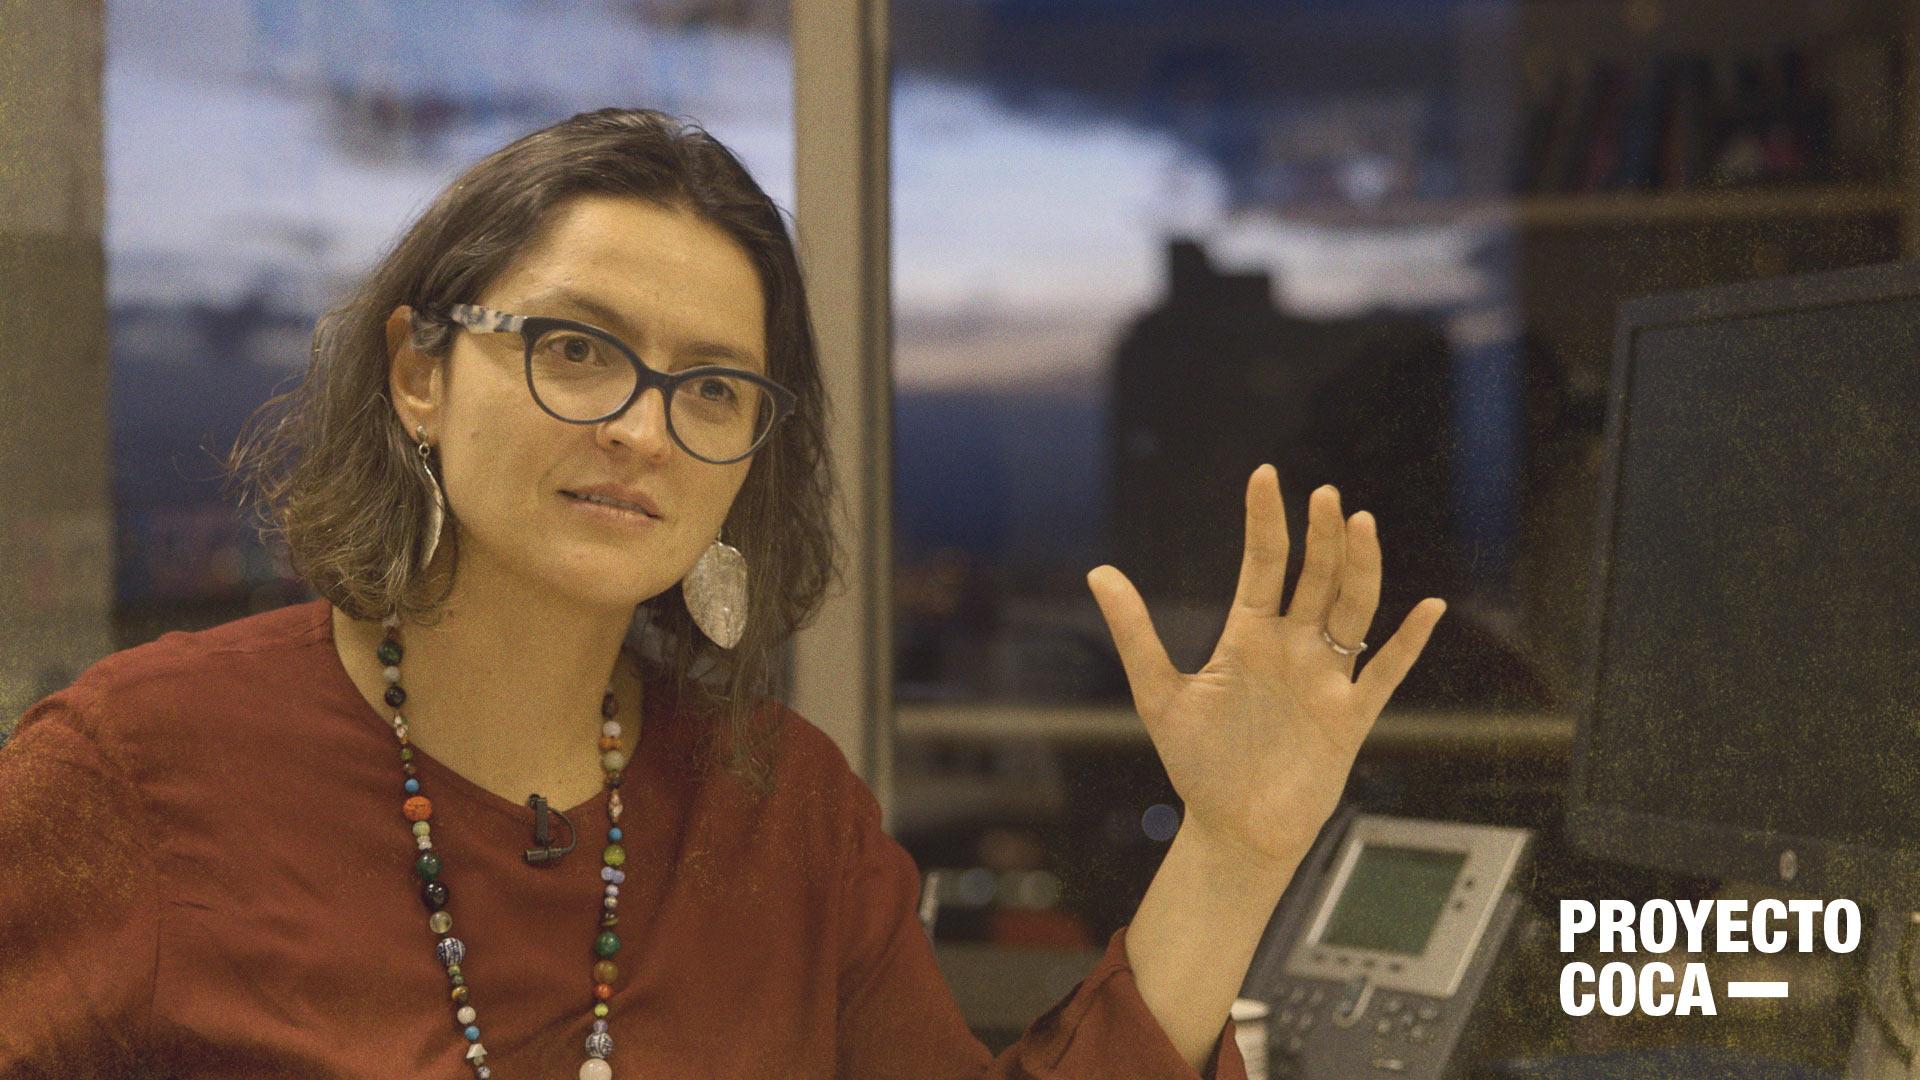 'Hay comunidades que no están cultivando coca, escuchémoslas': María Alejandra Vélez